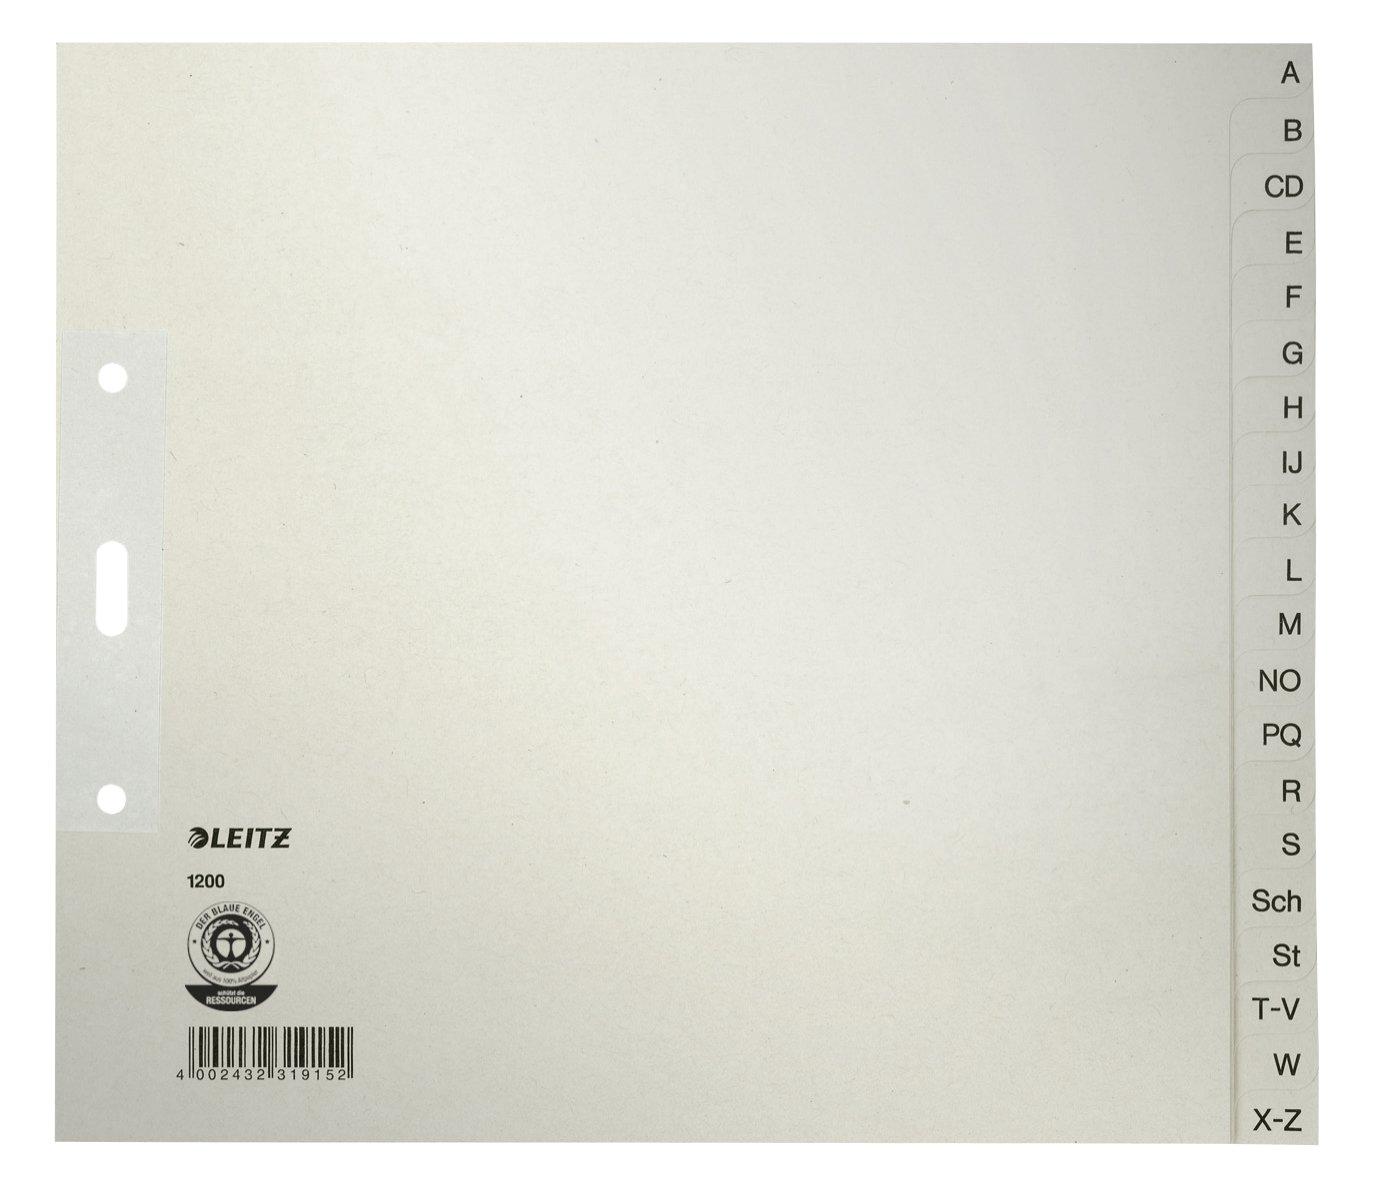 Register A-Z Tauenpapier, 24,0x21cm, A4 halbe Hö he, 20 Blatt, lichtgrau Leitz 1200-00-85